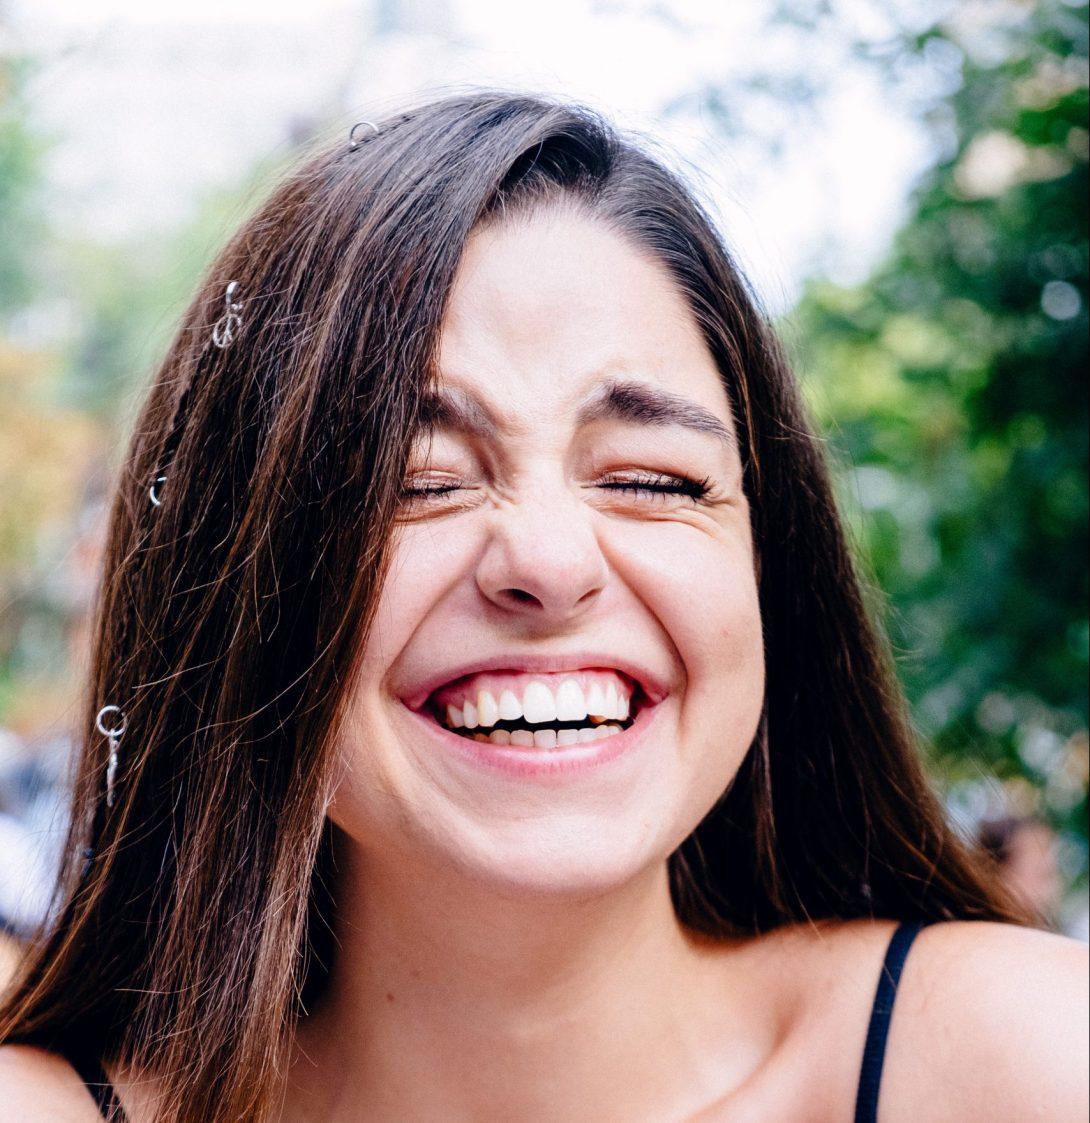 4 Ways Beyond Brushing to Keep Your Teeth Healthy